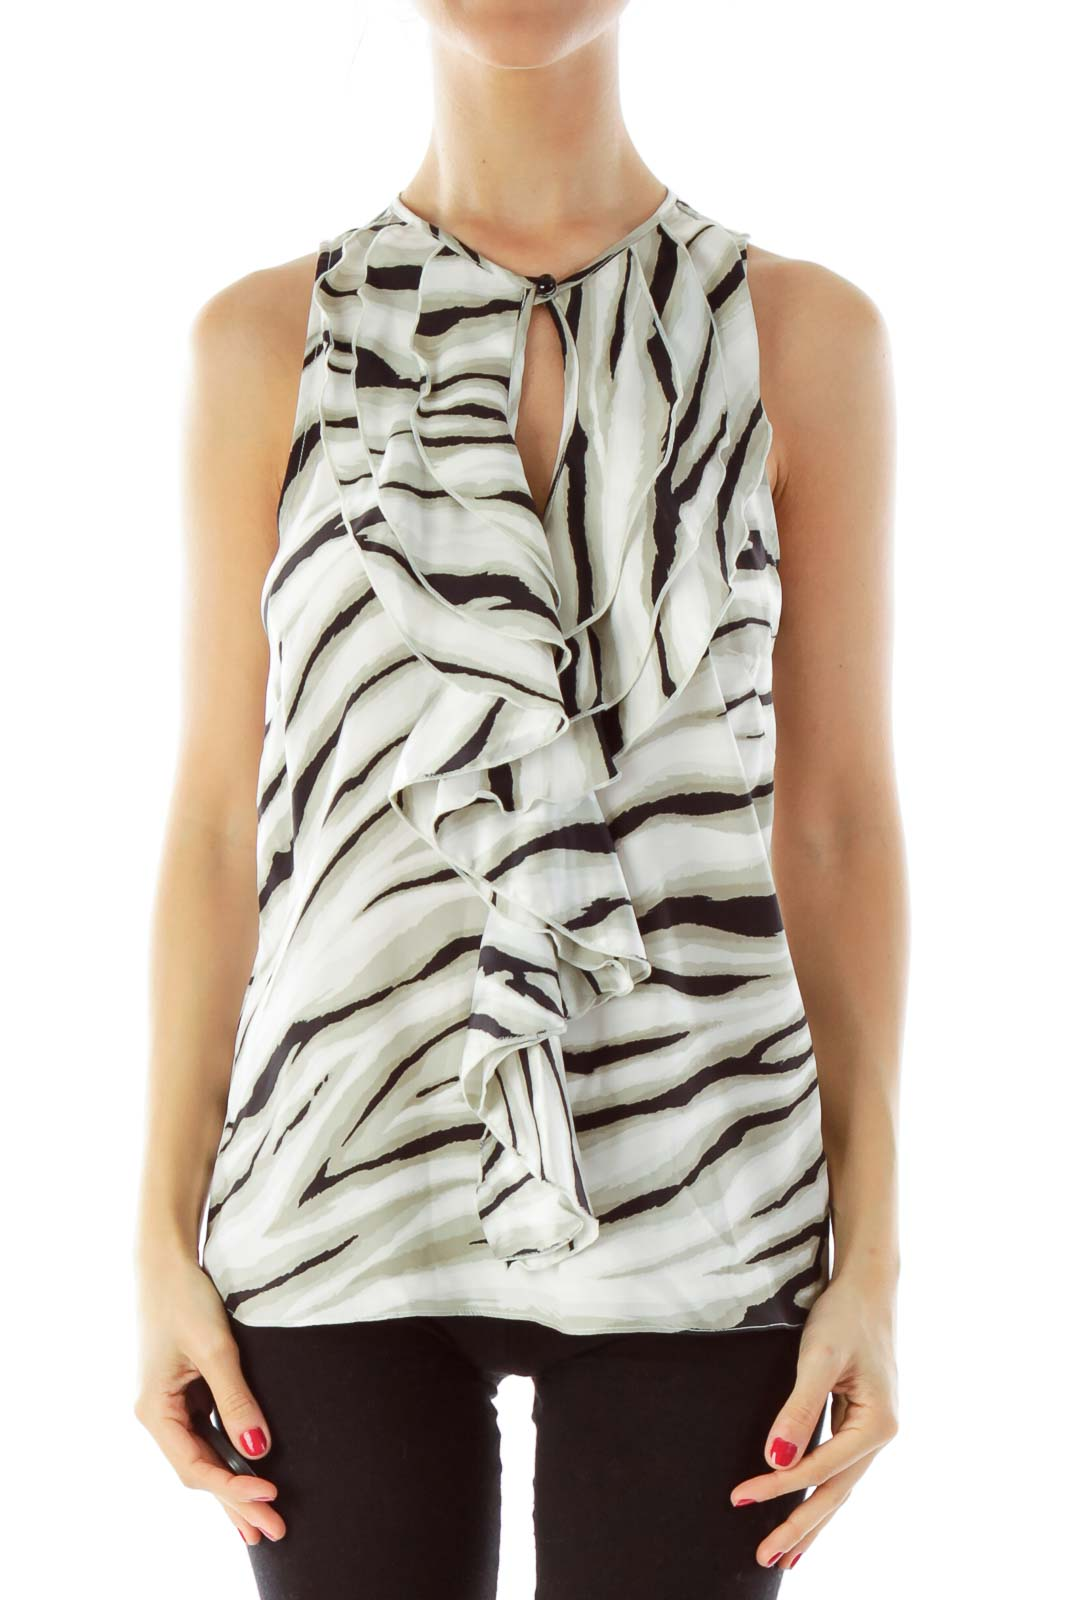 Gray & Black Zebra Print Blouse